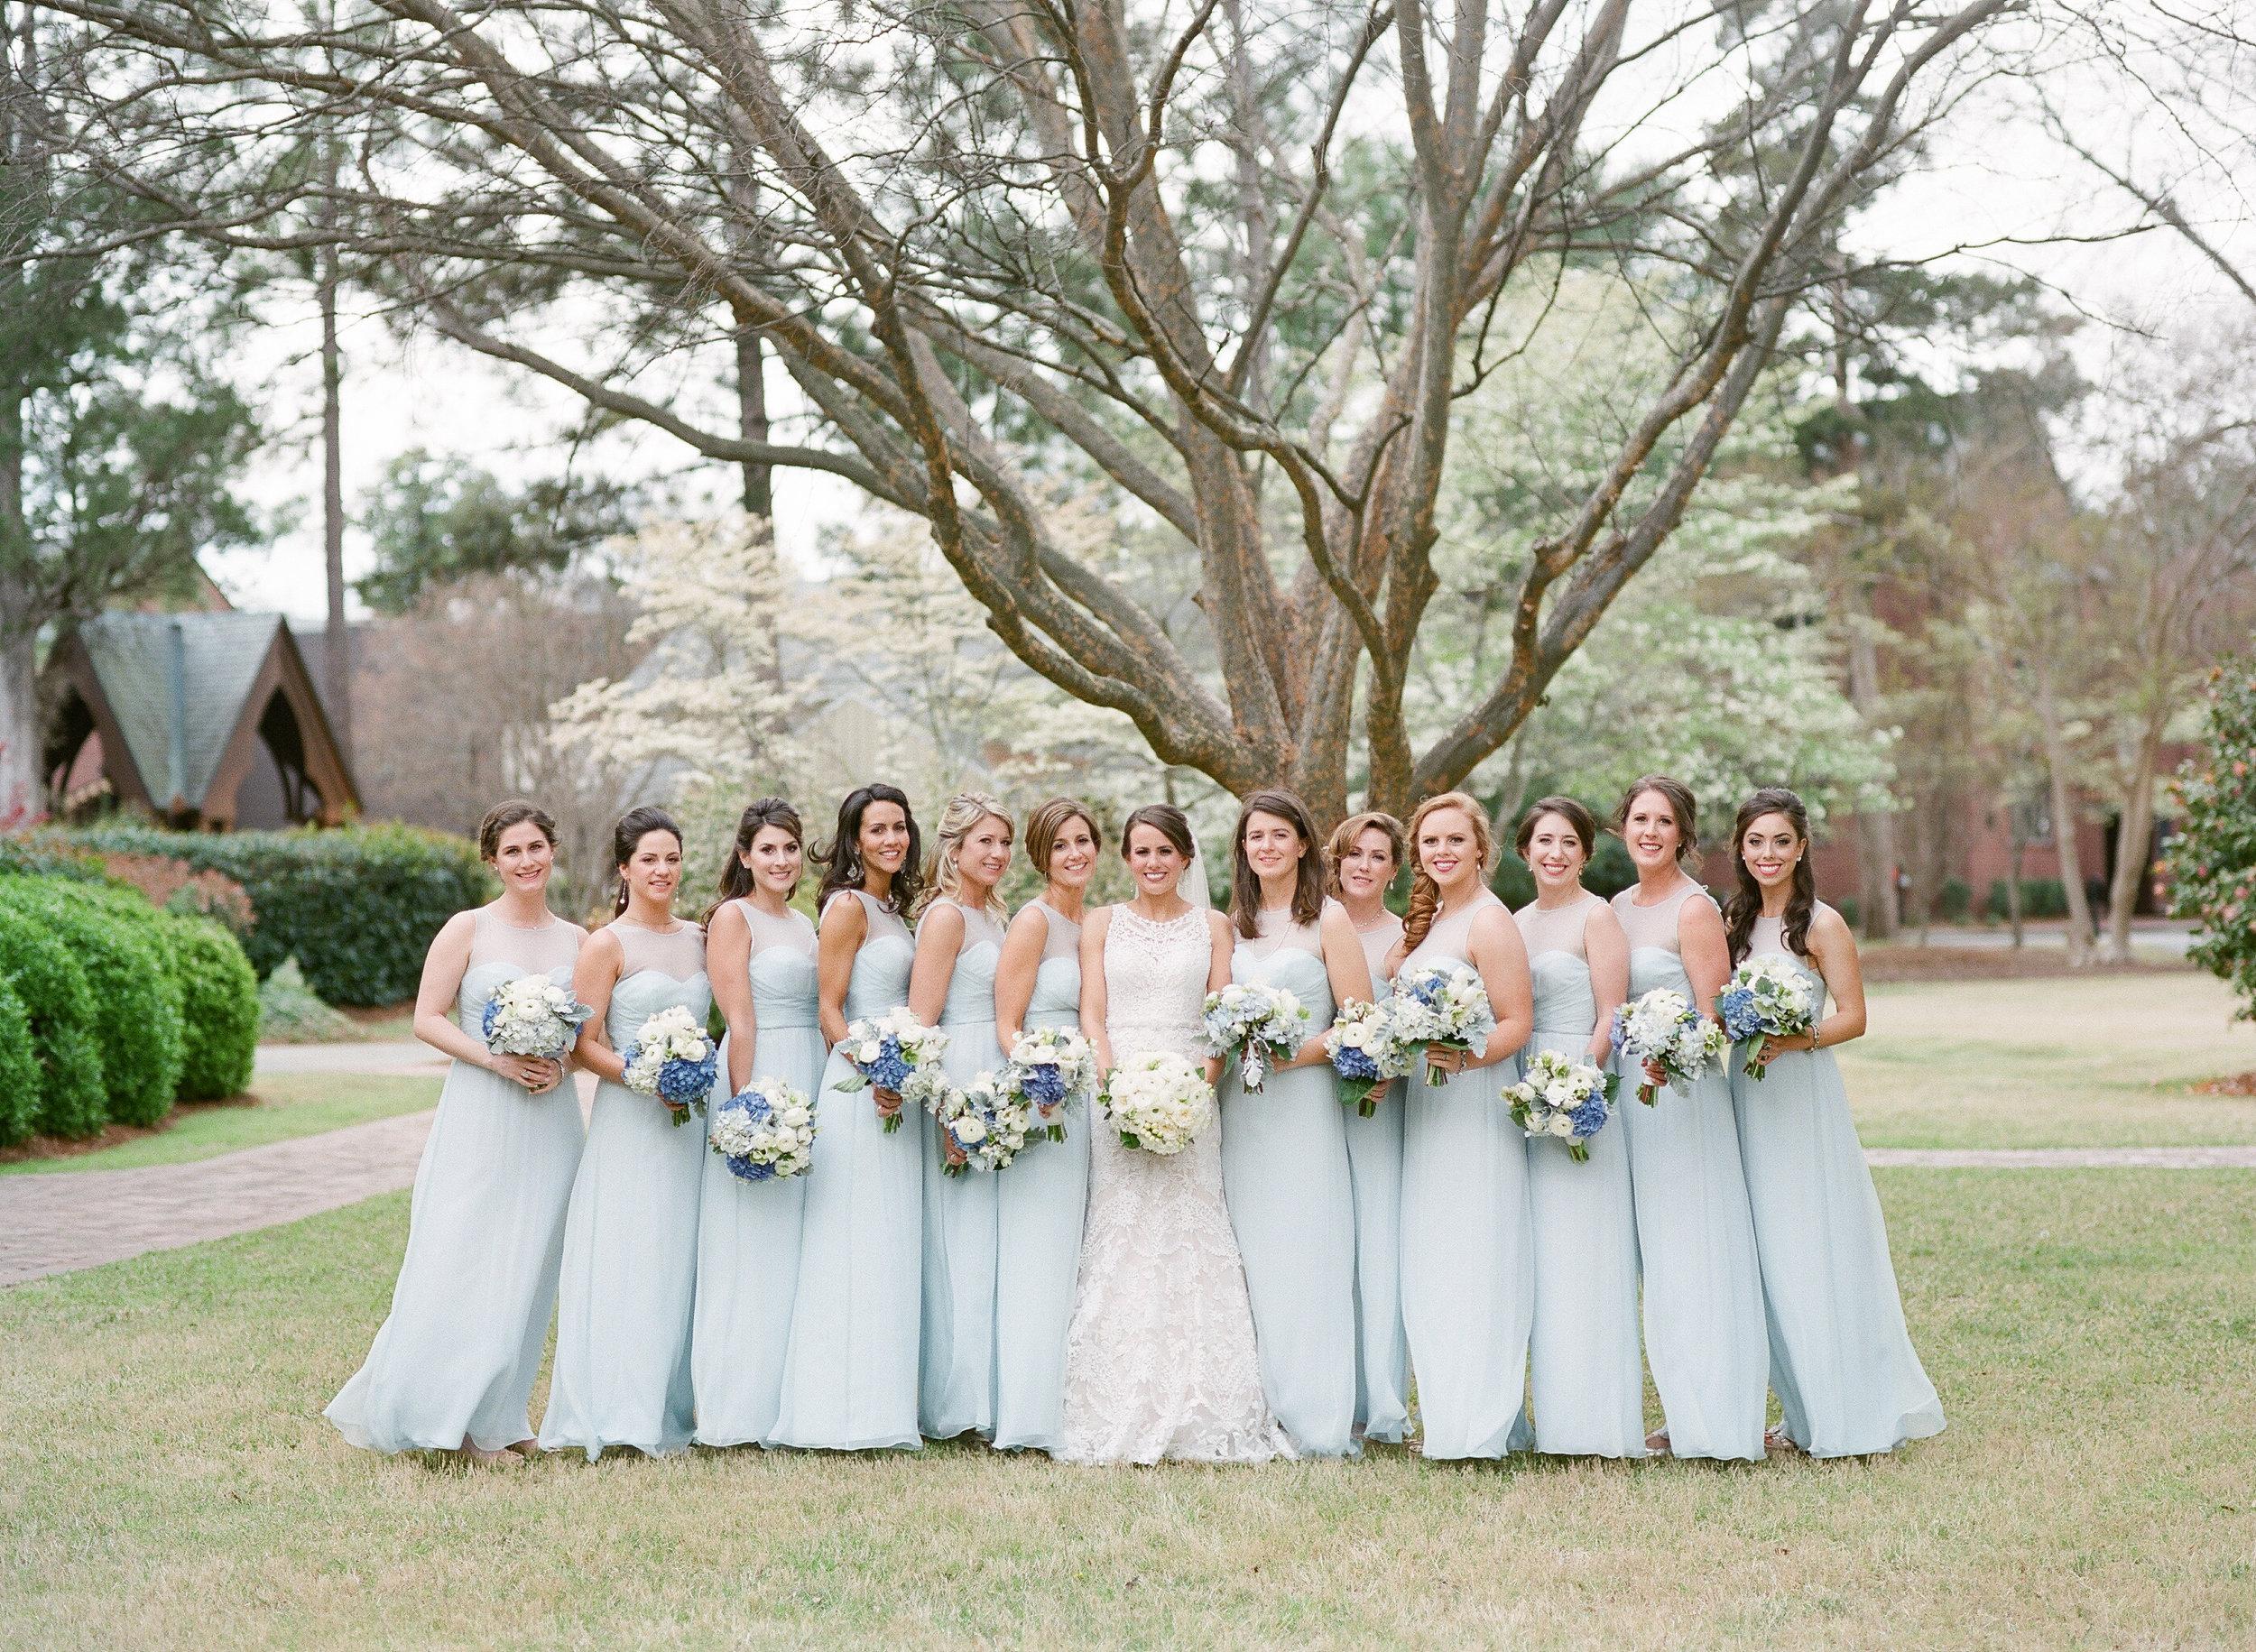 ashley seawell wedding photographer